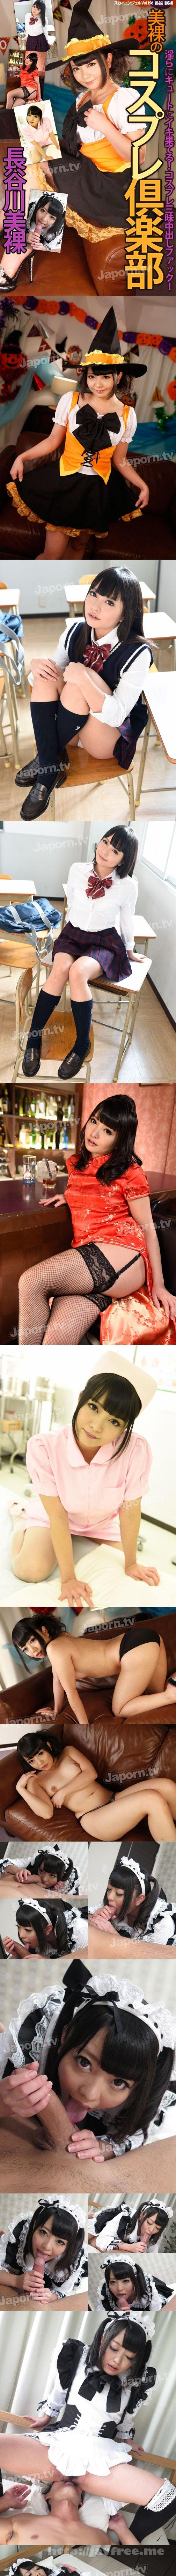 [SKY 330] スカイエンジェル Vol.198 : 長谷川美裸 長谷川美裸 SKY Mira Hasegawa